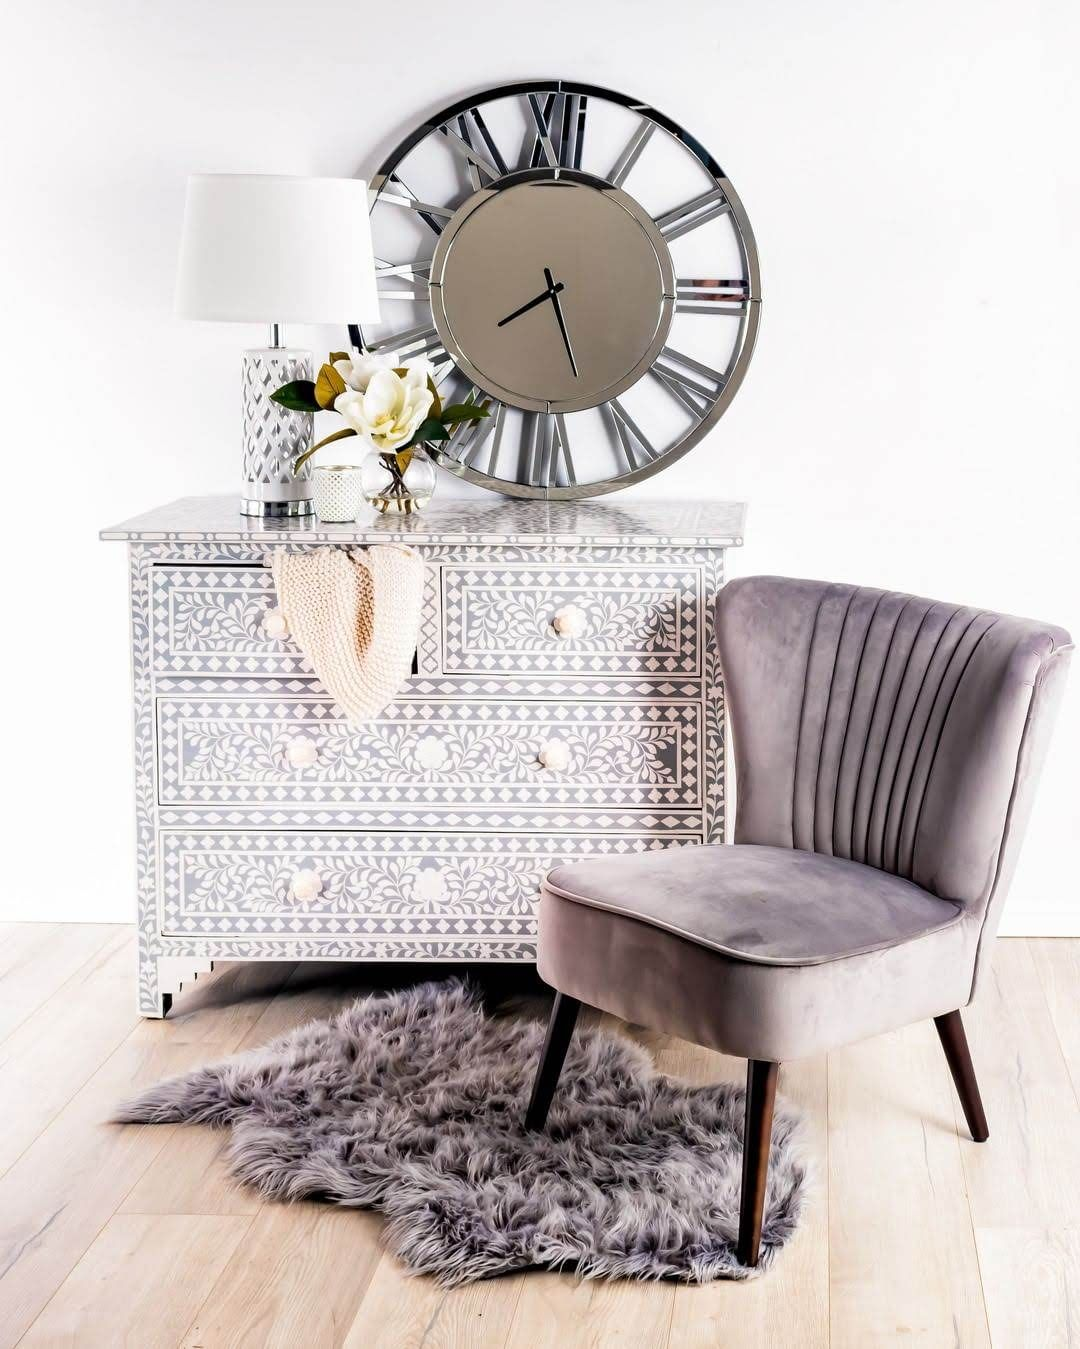 Elit Dekor Masa Sandalye 0555 399 39 02 Instagram Elitdekorsandalyemasa In 2020 Home Decor Decor House Interior